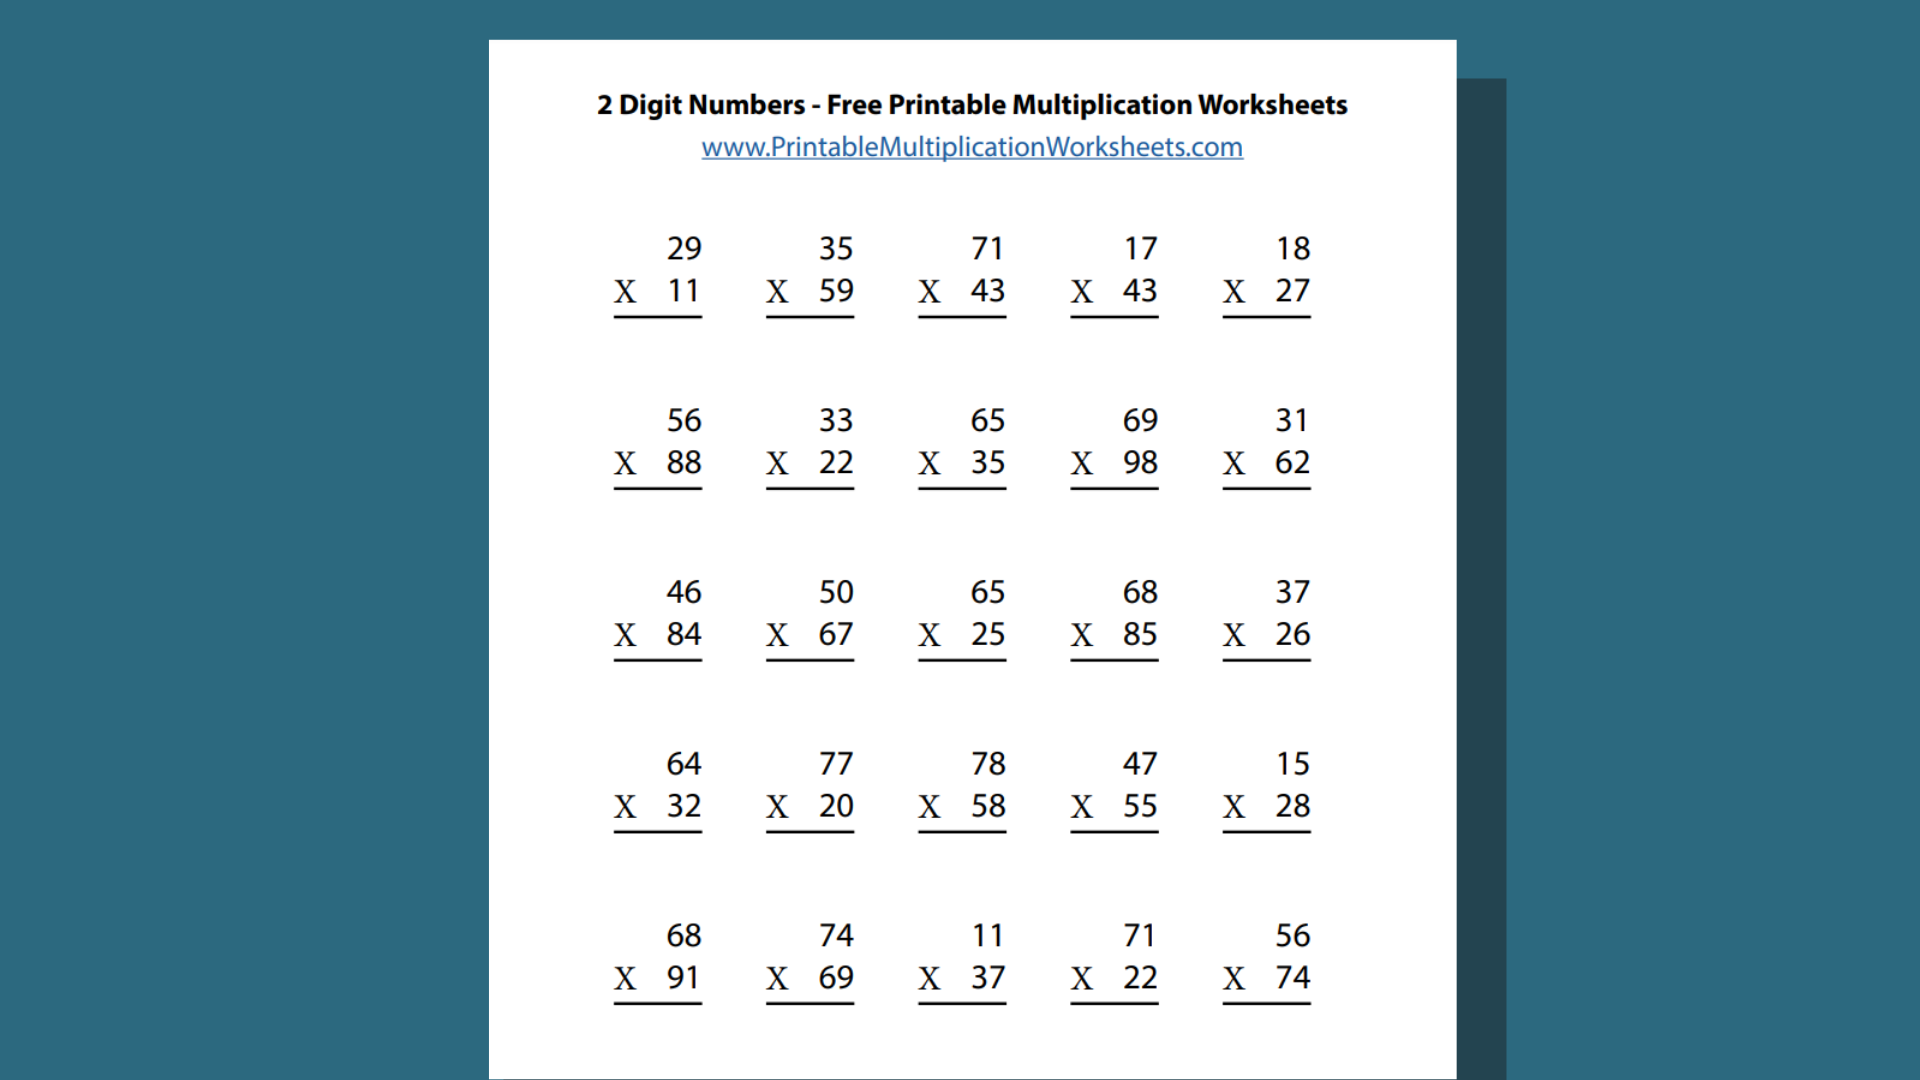 2 Digit Numbers - Free Printable Multiplication Worksheets FEATURED